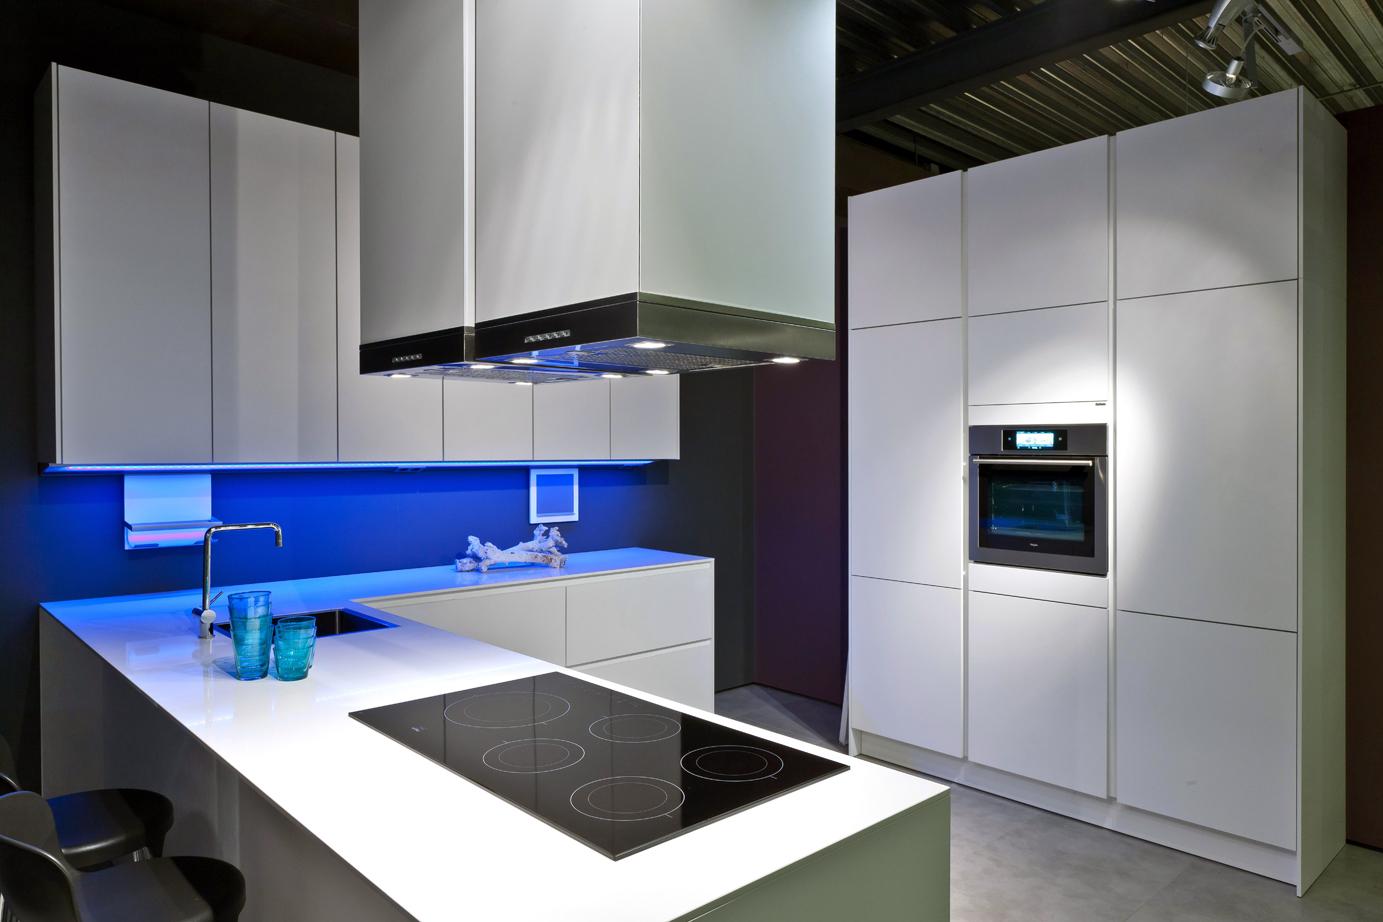 Siemens Keukens Nederland : Moderne greeploze siematic design keuken lelieblank db keukens